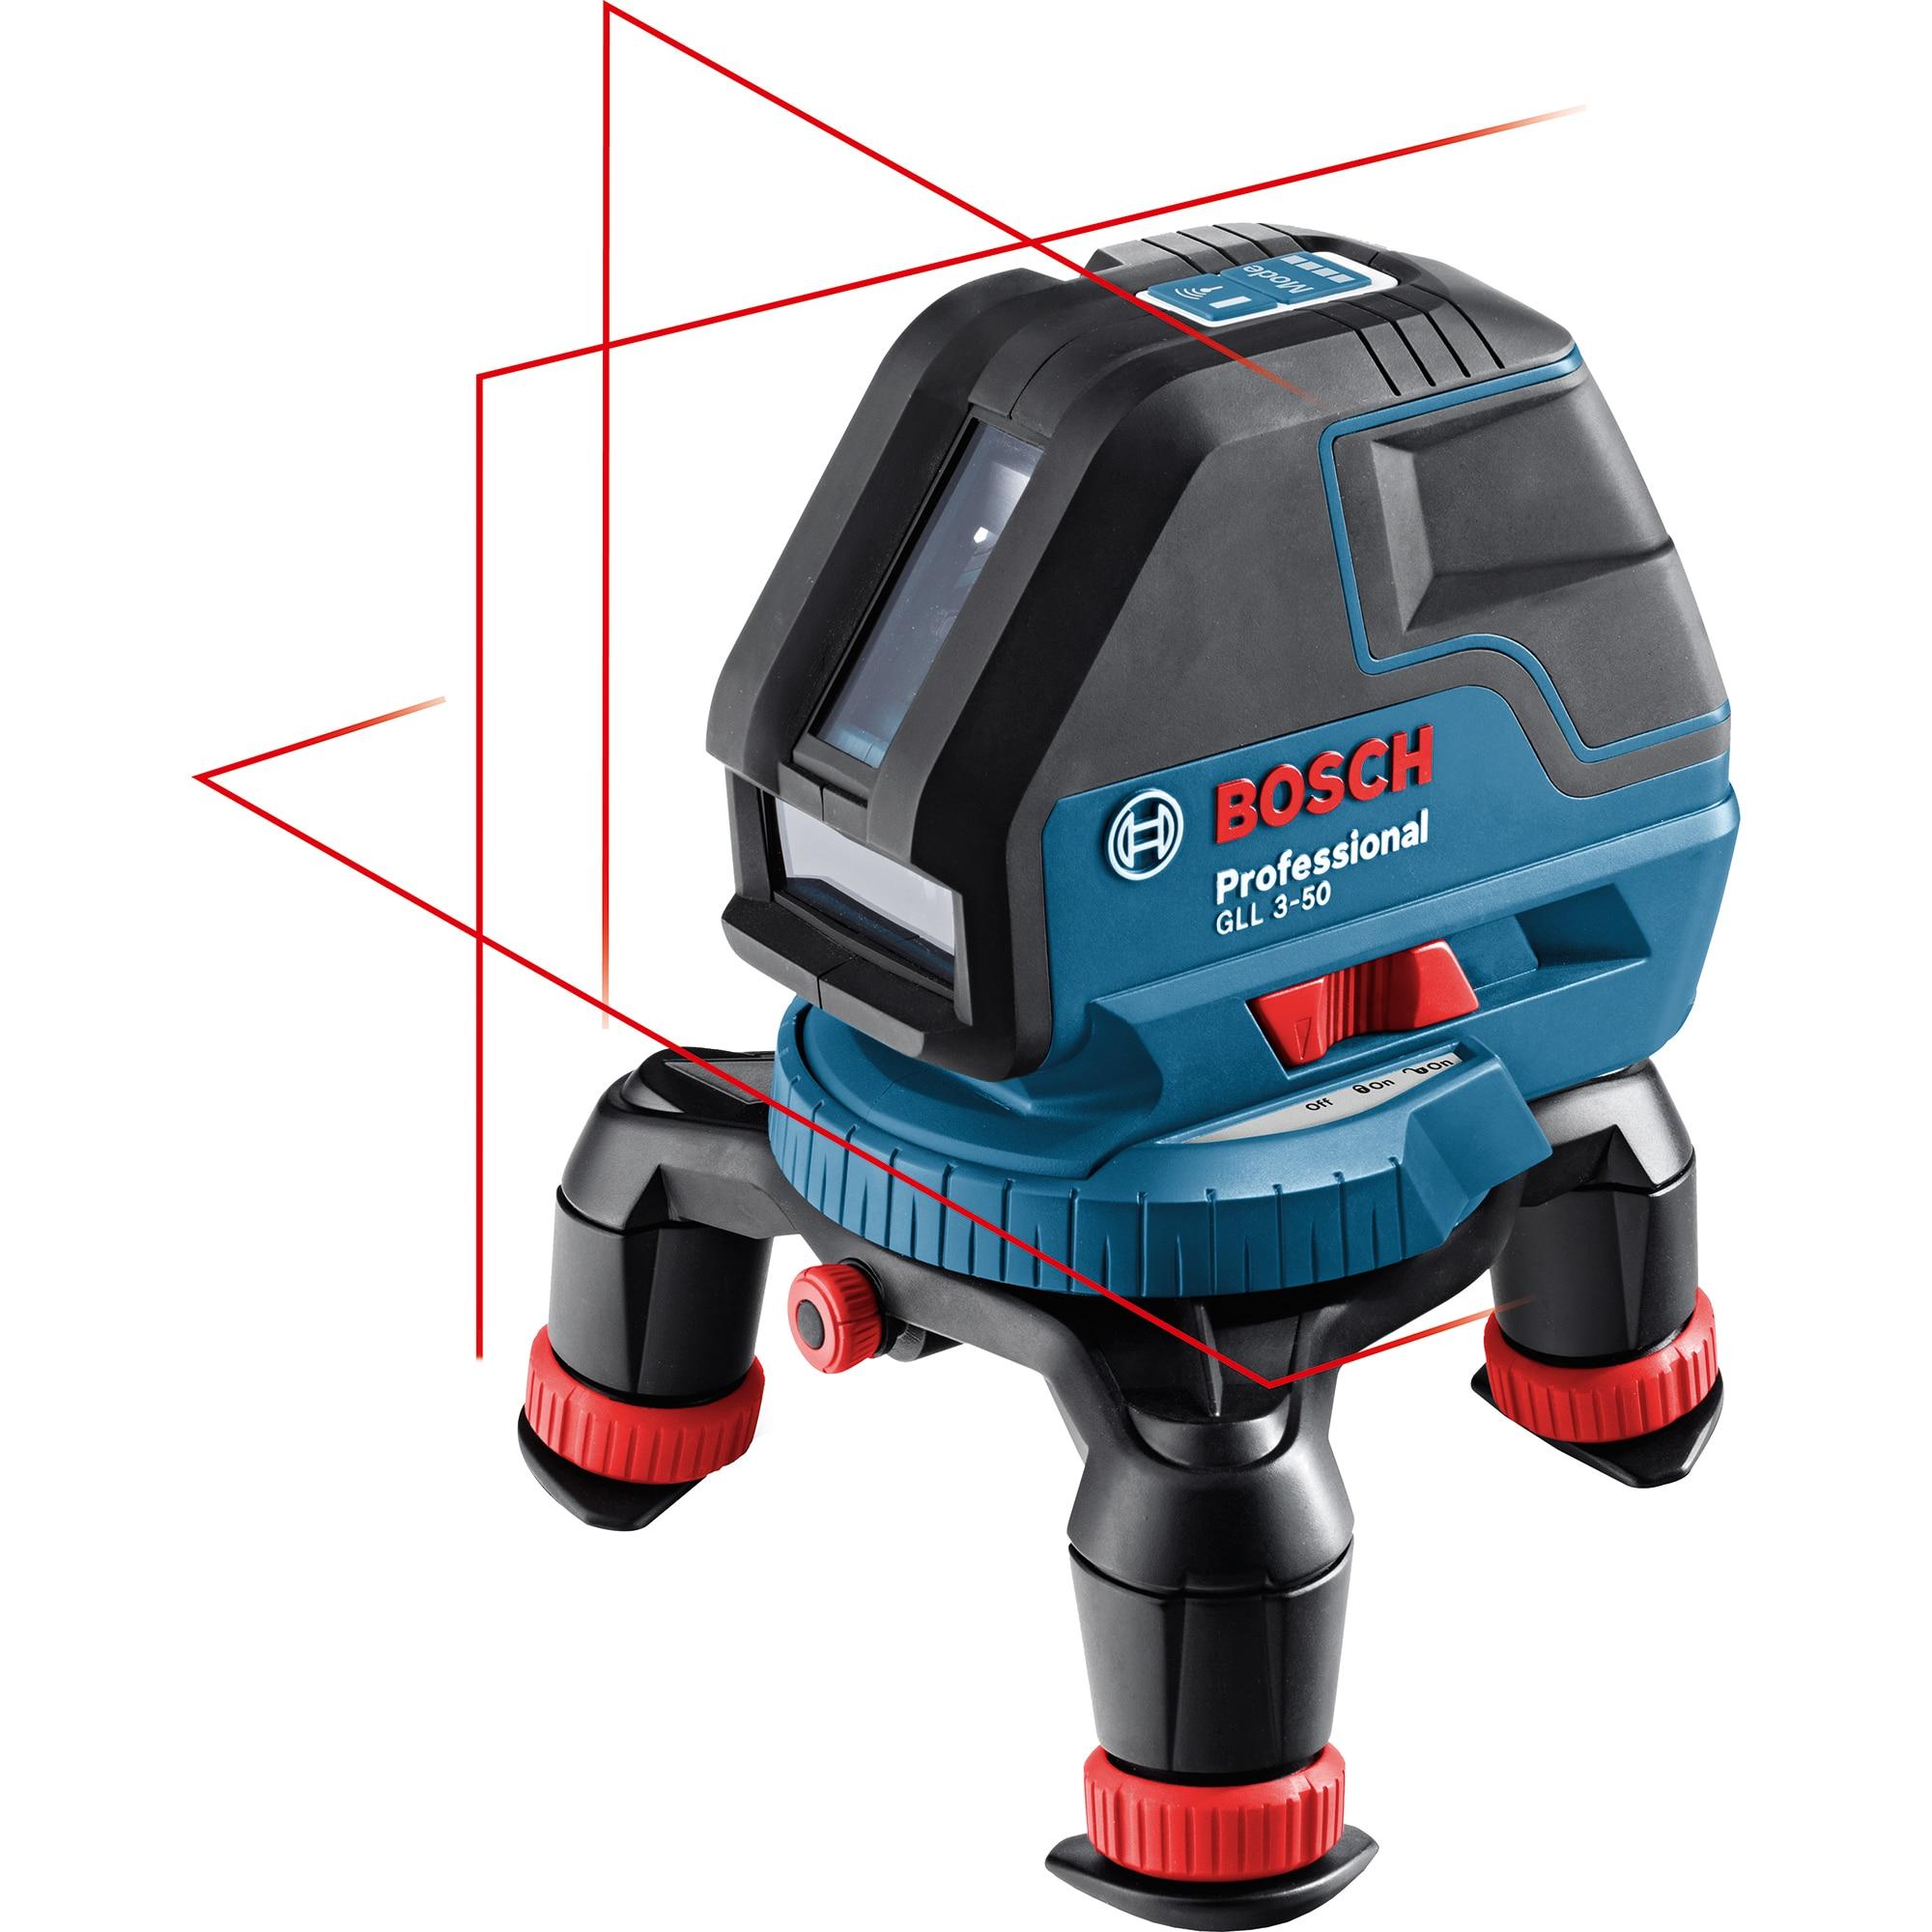 Fotografie Nivela laser cu linii Bosch Professional GLL 3-50, 10 m, ± 0.3 mm/m precizie, 635 dioda laser, ± 4° domeniu de autonivelare